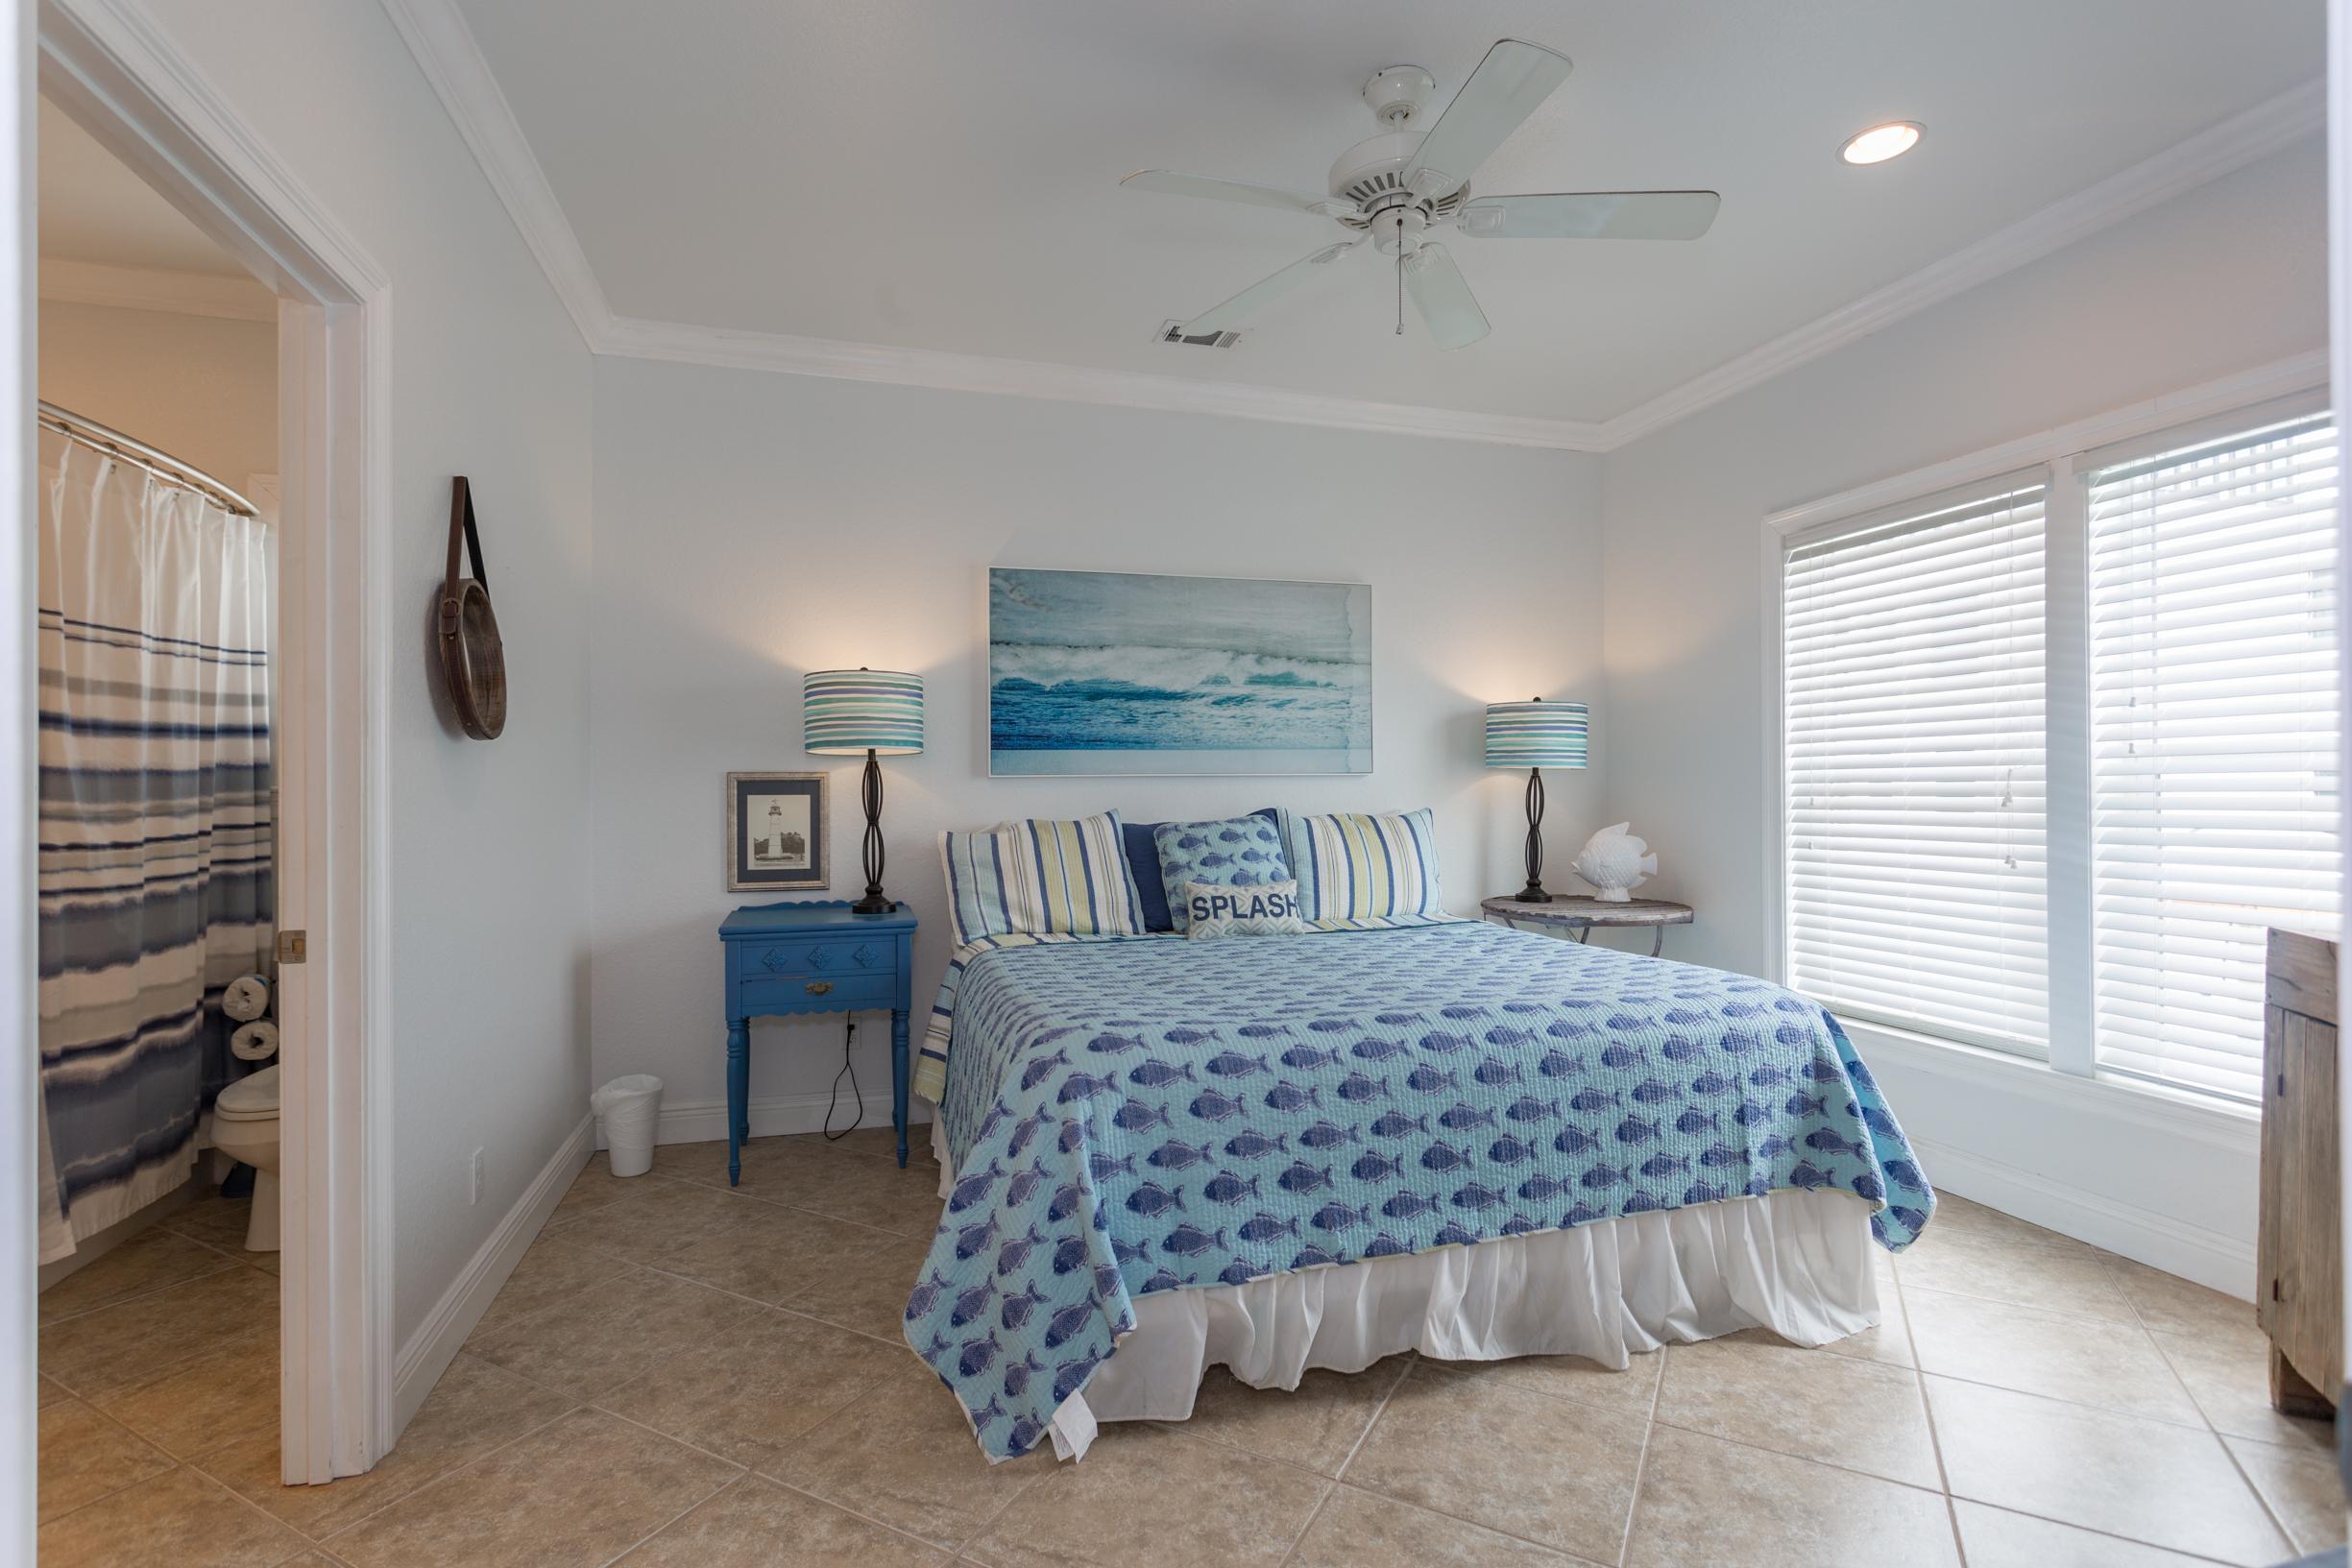 Ariola 1003 - The Starfish House House/Cottage rental in Pensacola Beach House Rentals in Pensacola Beach Florida - #23